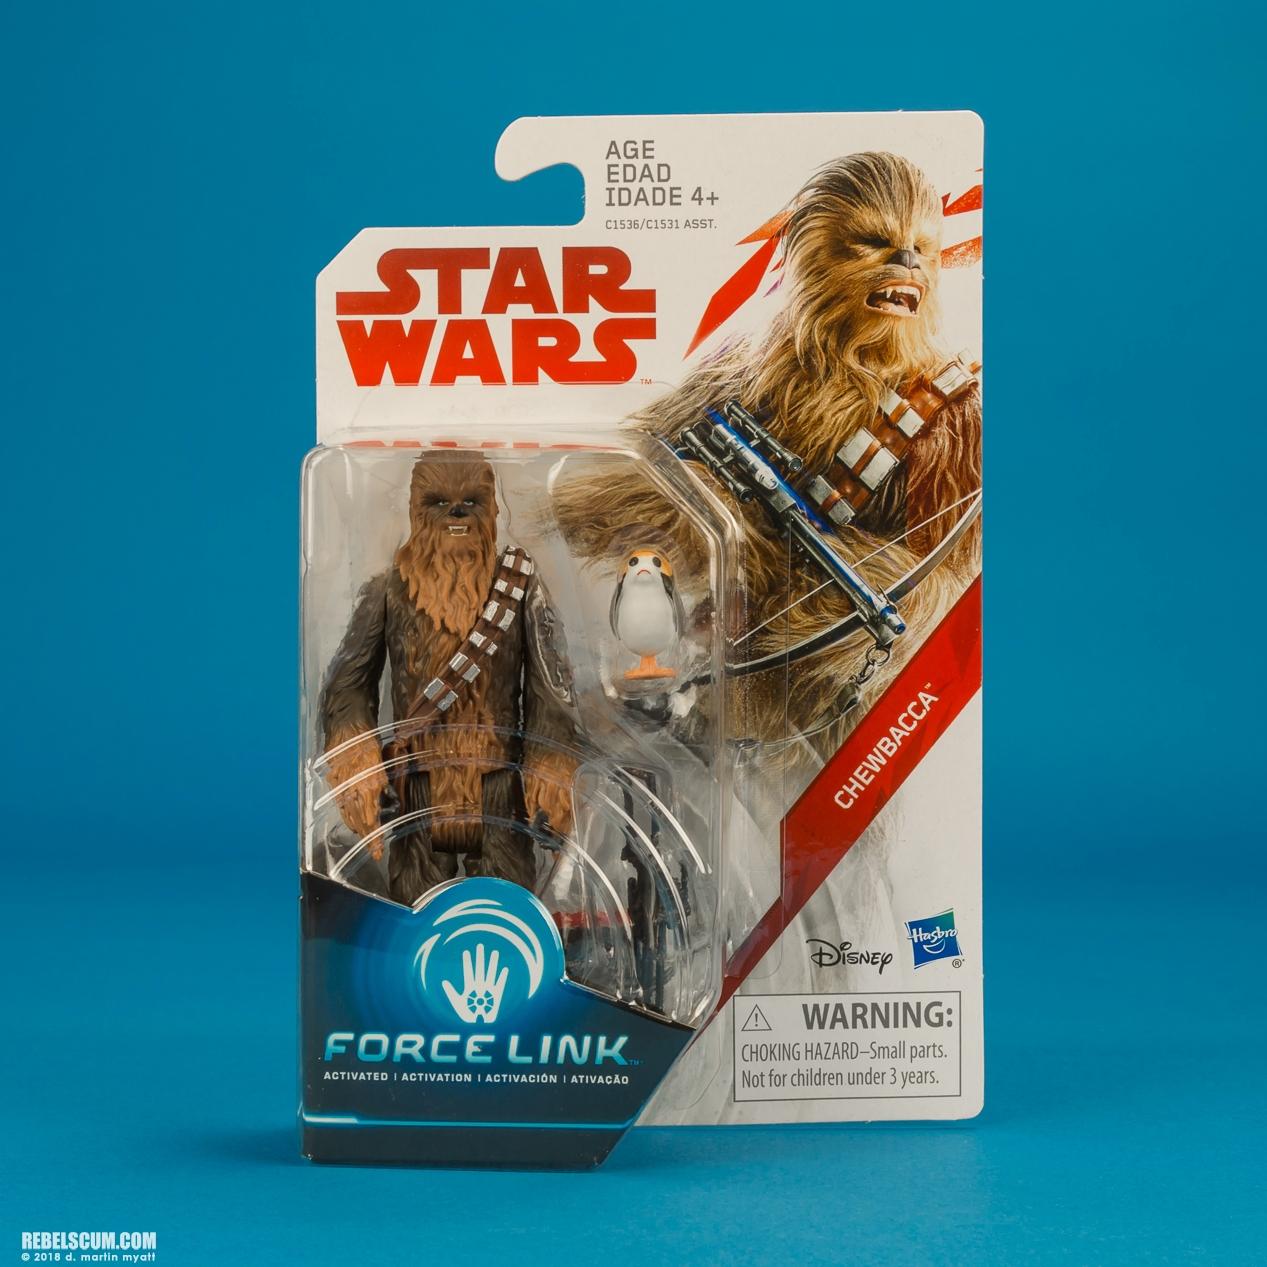 the-last-jedi-star-wars-universe-chewbacca-porg-variation-001.jpg